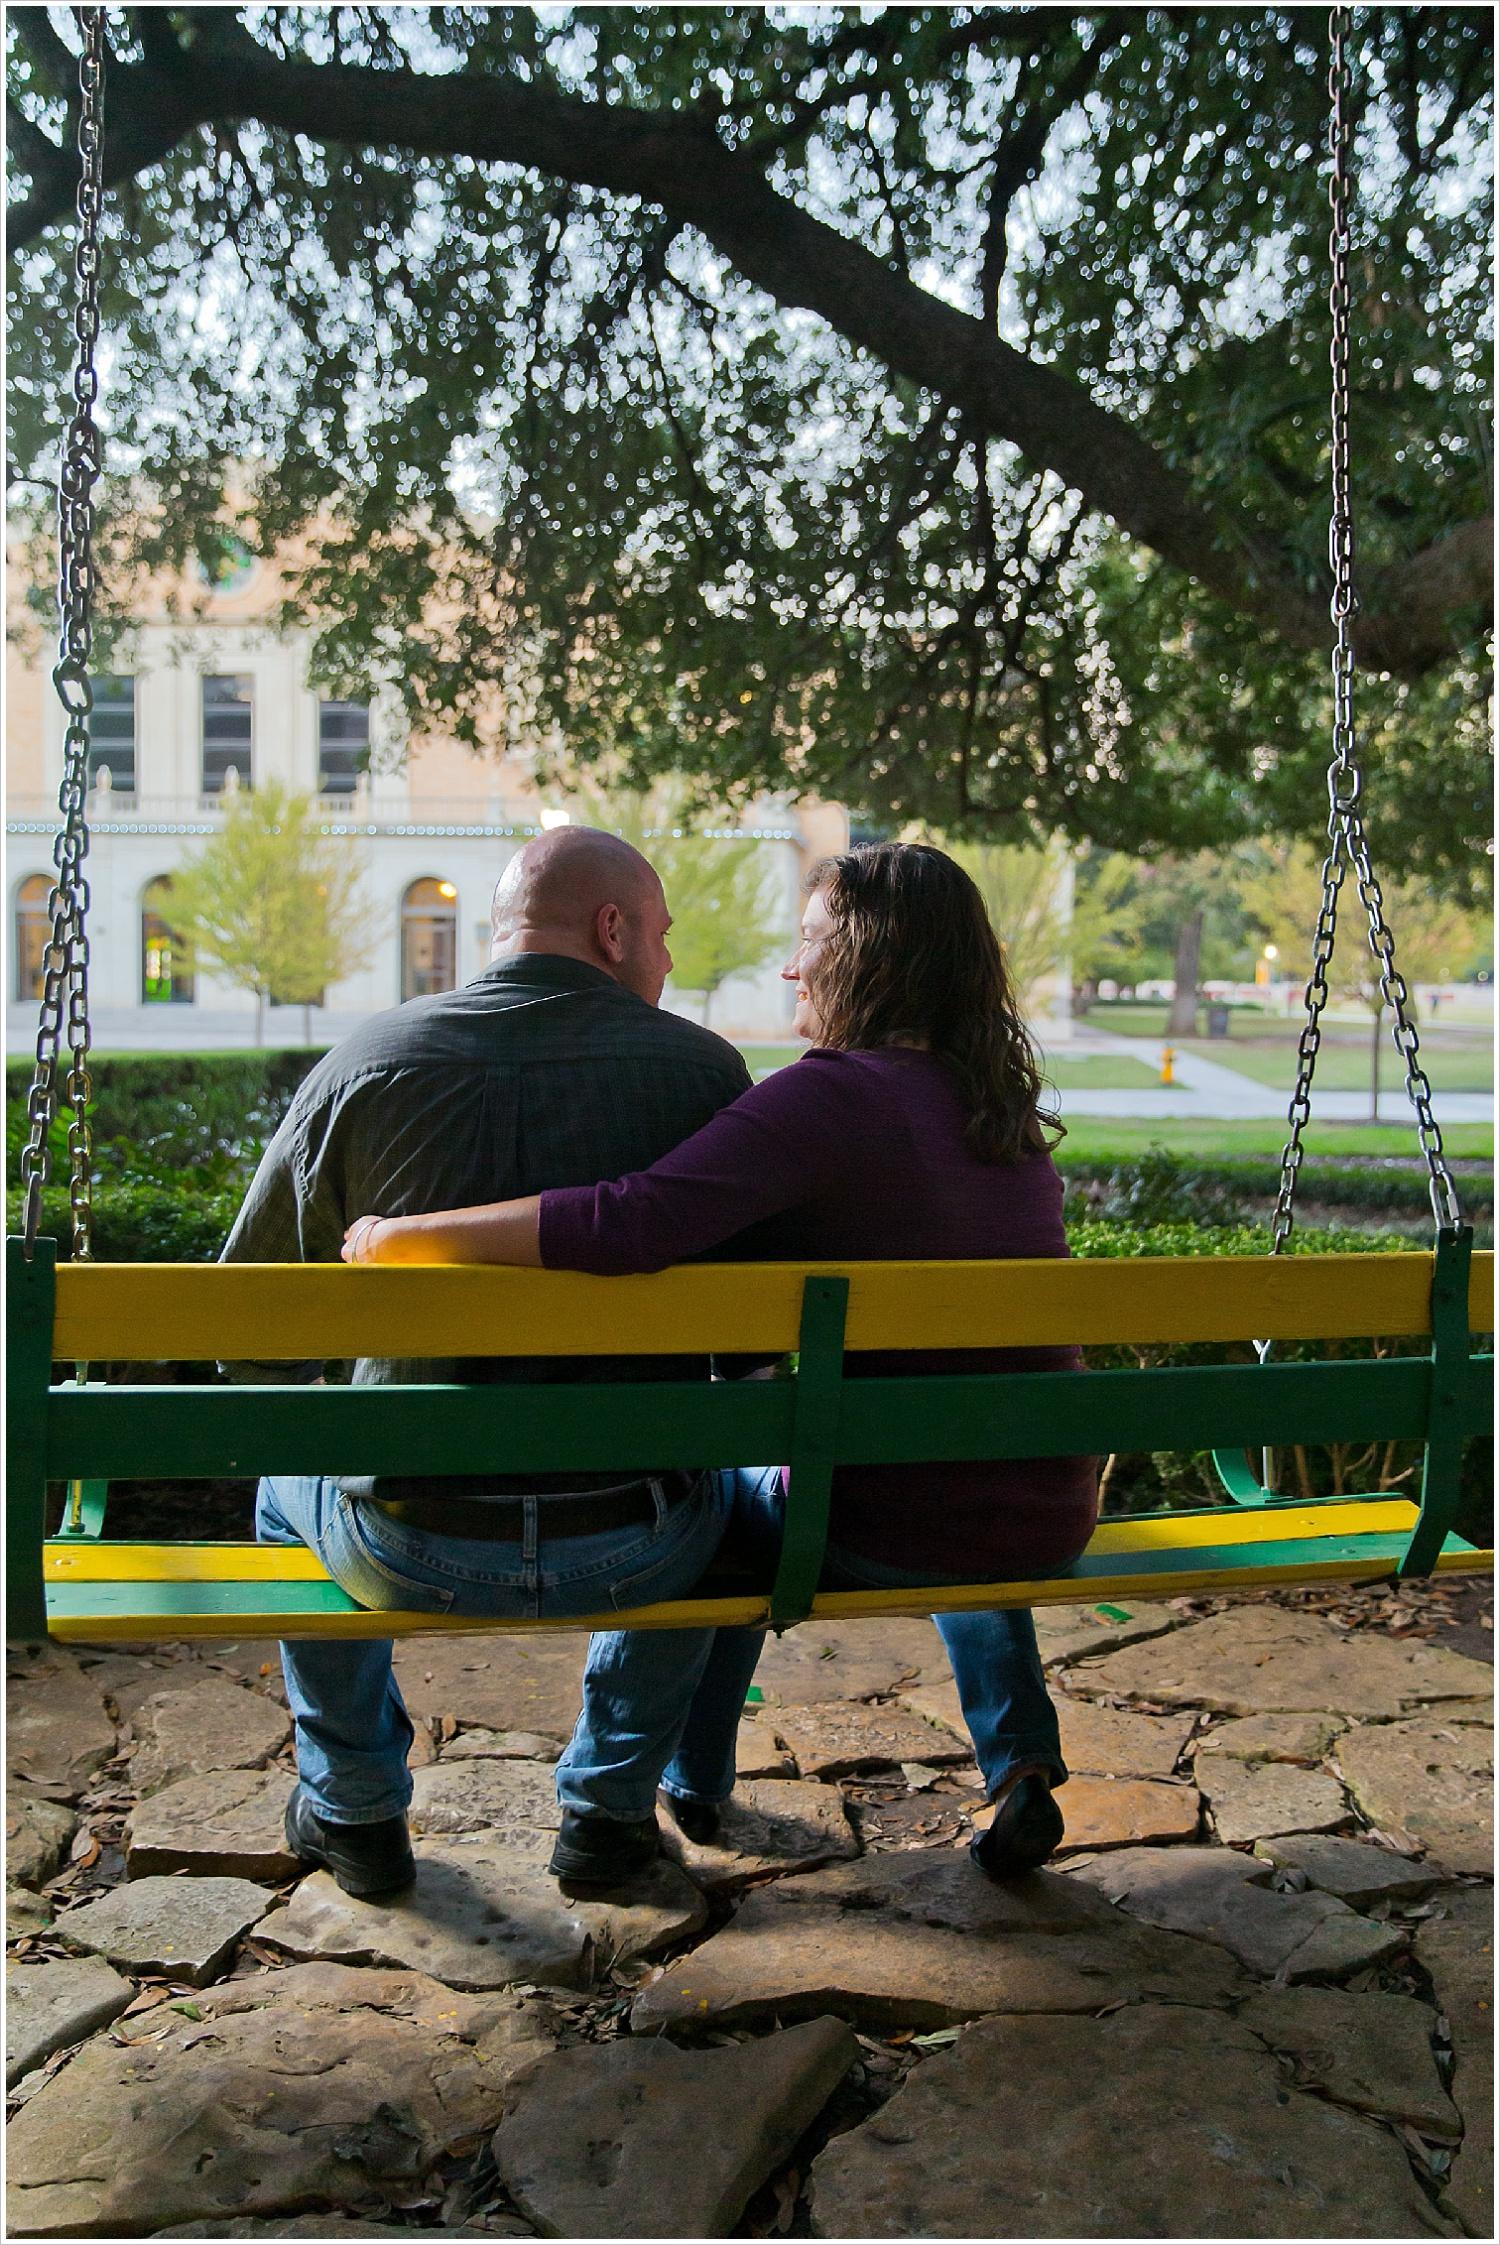 engagement portraits on green and gold swings at Baylor | Waco, Texas | Jason & Melaina Photography